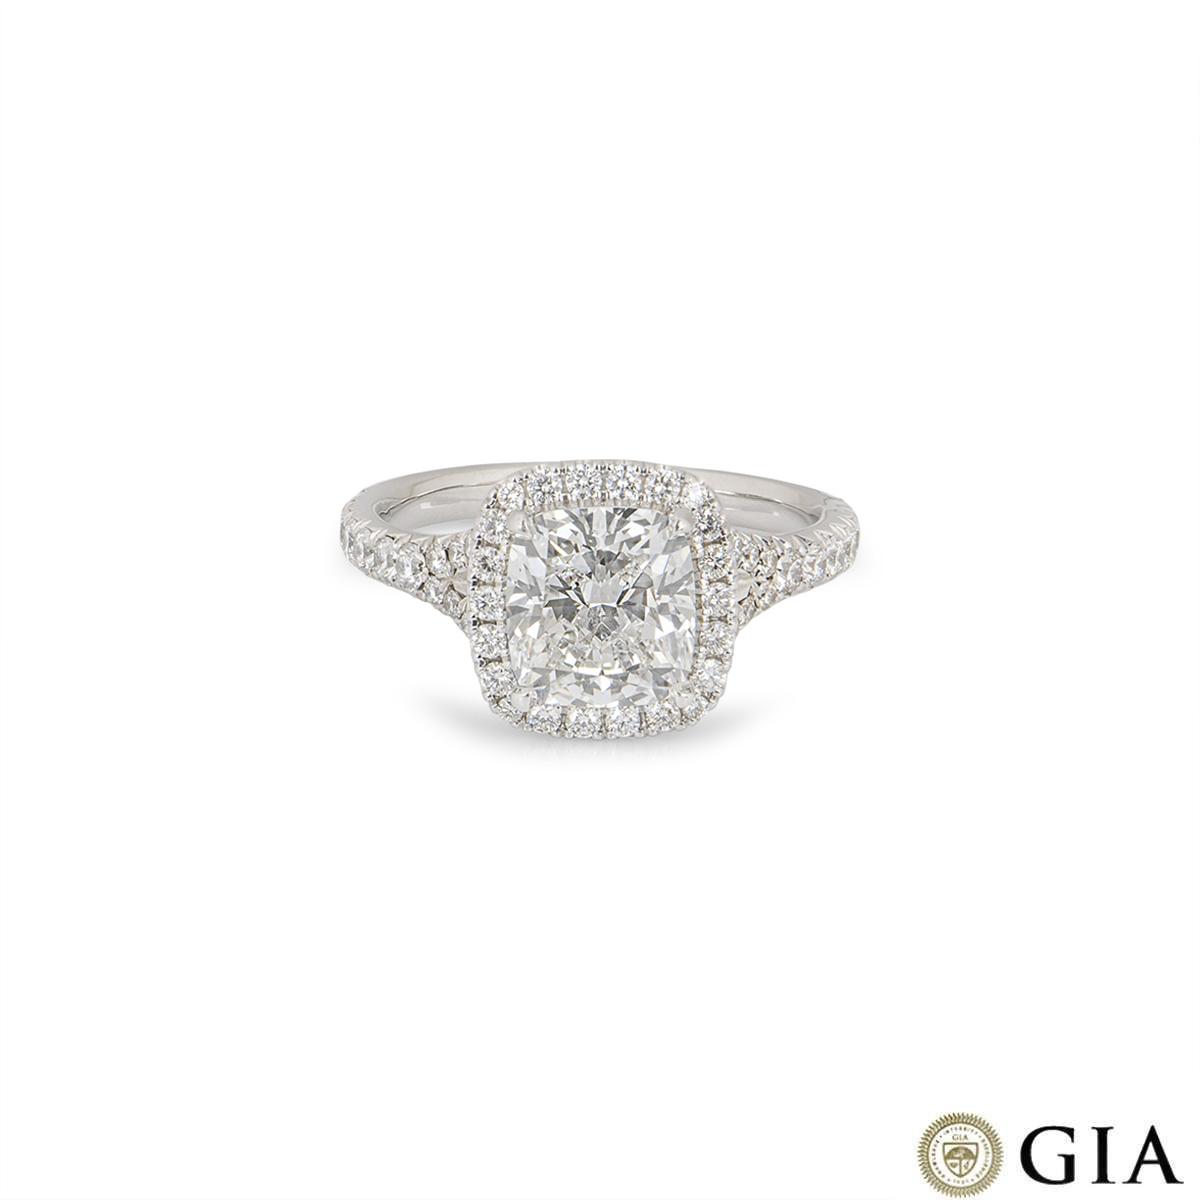 White Gold Cushion Cut Diamond Ring 2.14ct F/VS1